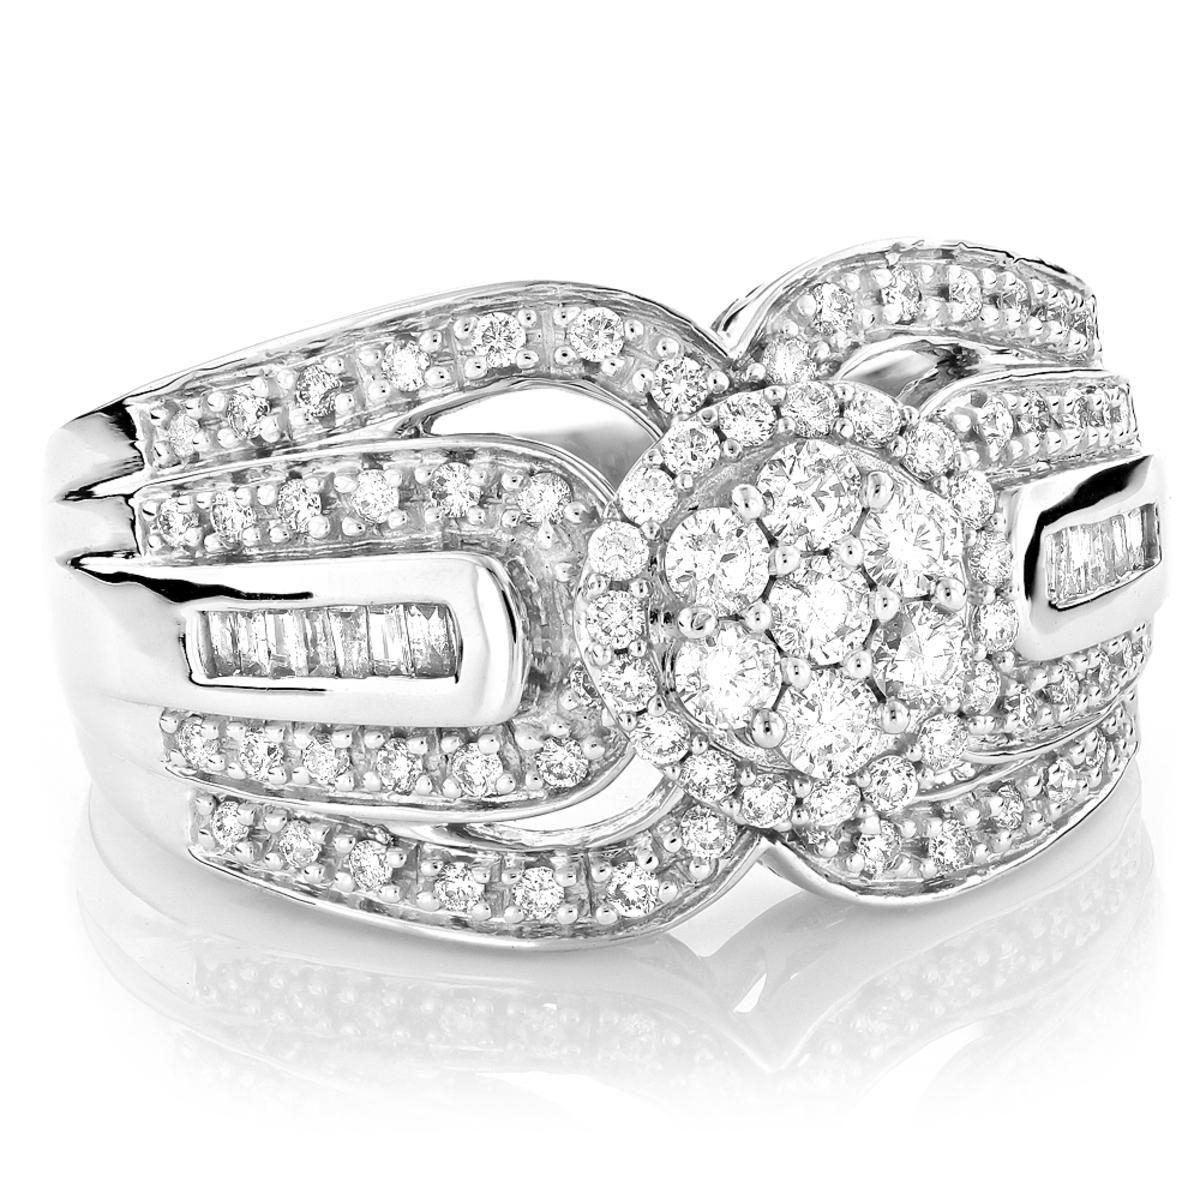 Ladies 14K Gold Pre-Set Diamond Engagement Ring 1.22ct